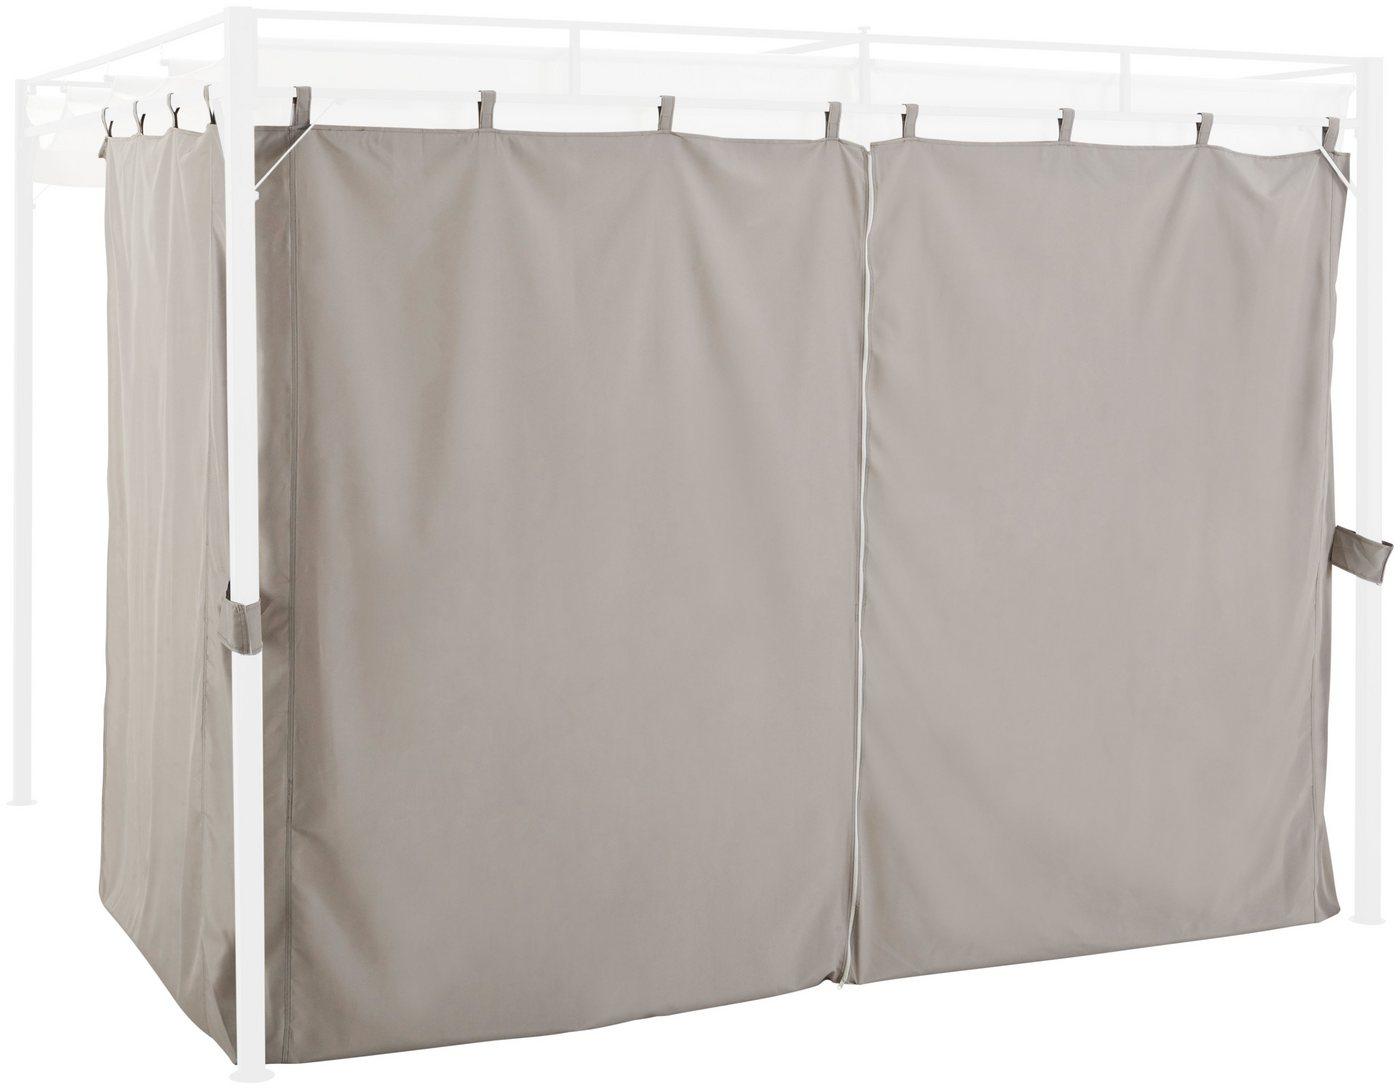 pavillon flachdach preisvergleiche erfahrungsberichte. Black Bedroom Furniture Sets. Home Design Ideas